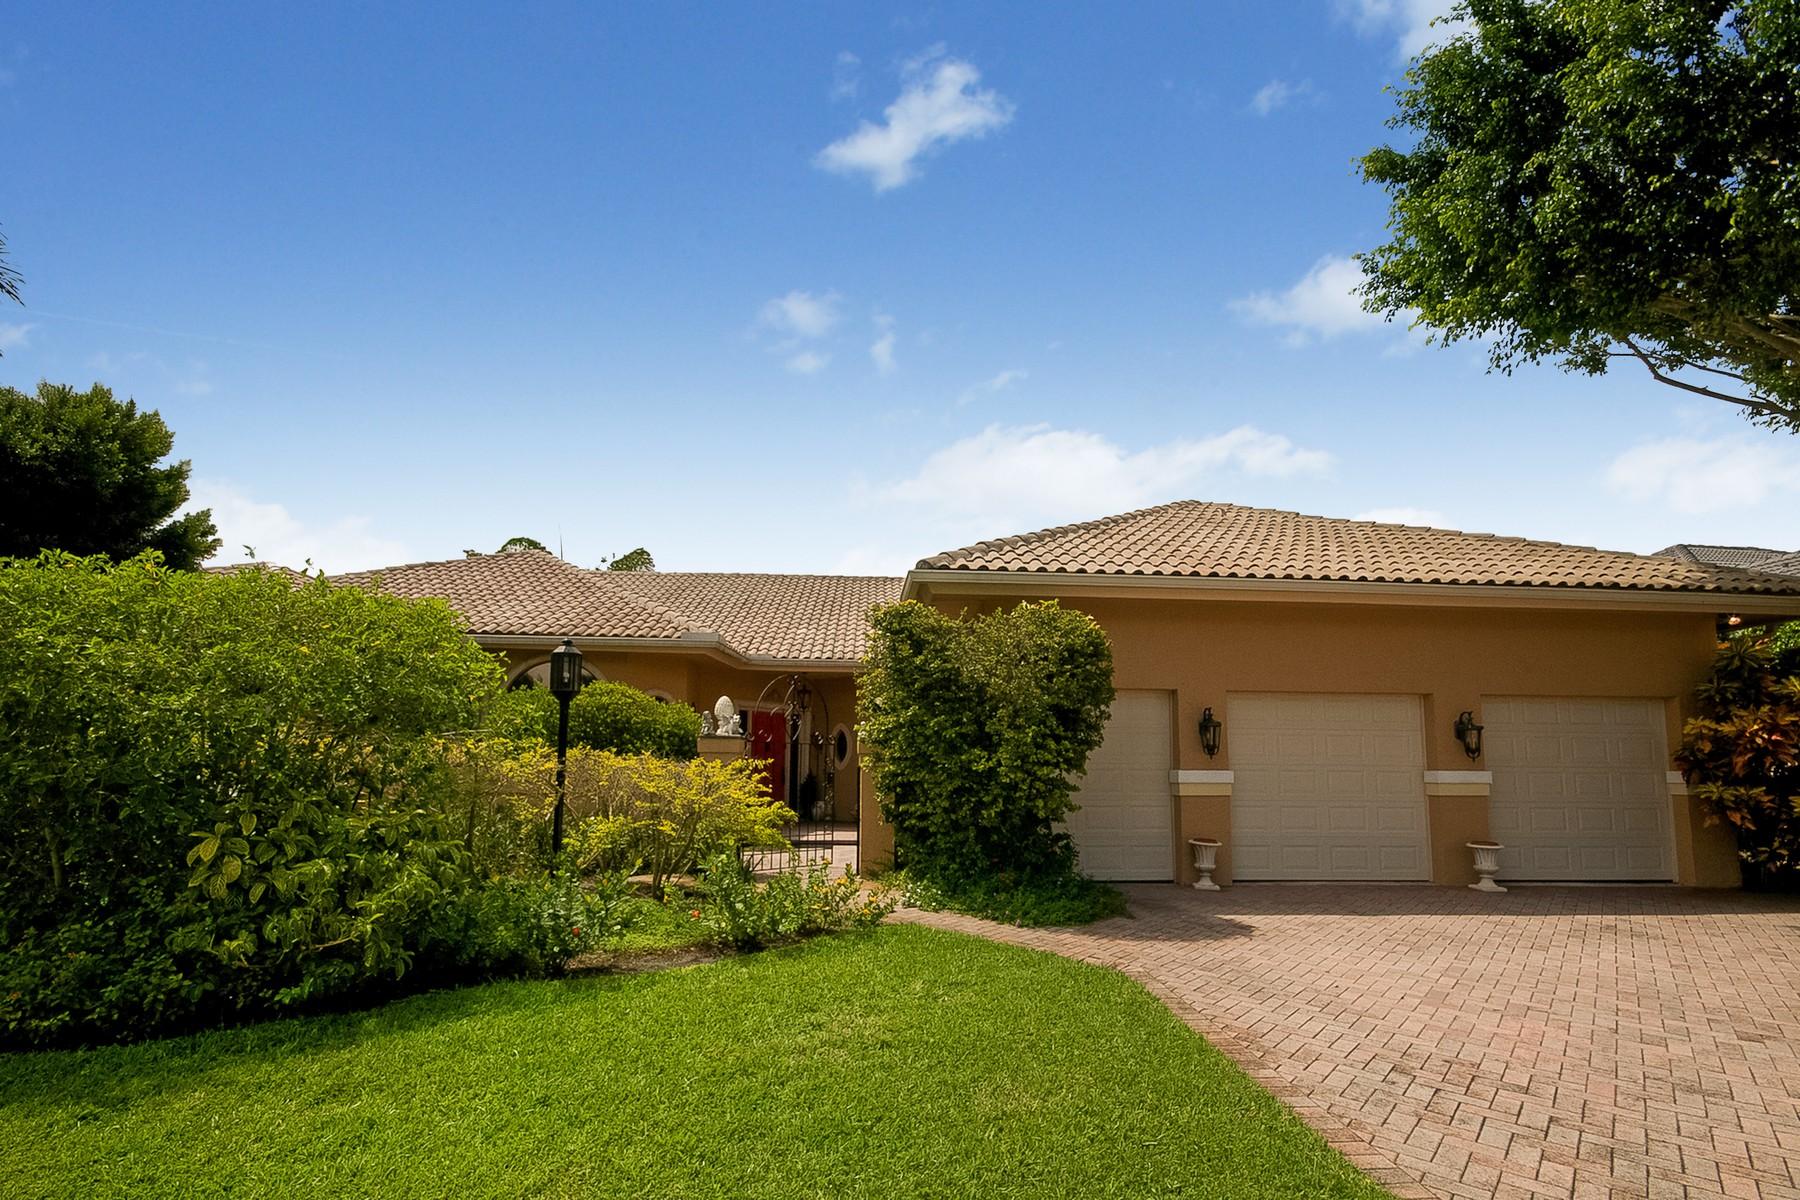 Villa per Vendita alle ore 7892 Mandarin Dr , Boca Raton, FL 33433 7892 Mandarin Dr Boca Raton, Florida, 33433 Stati Uniti